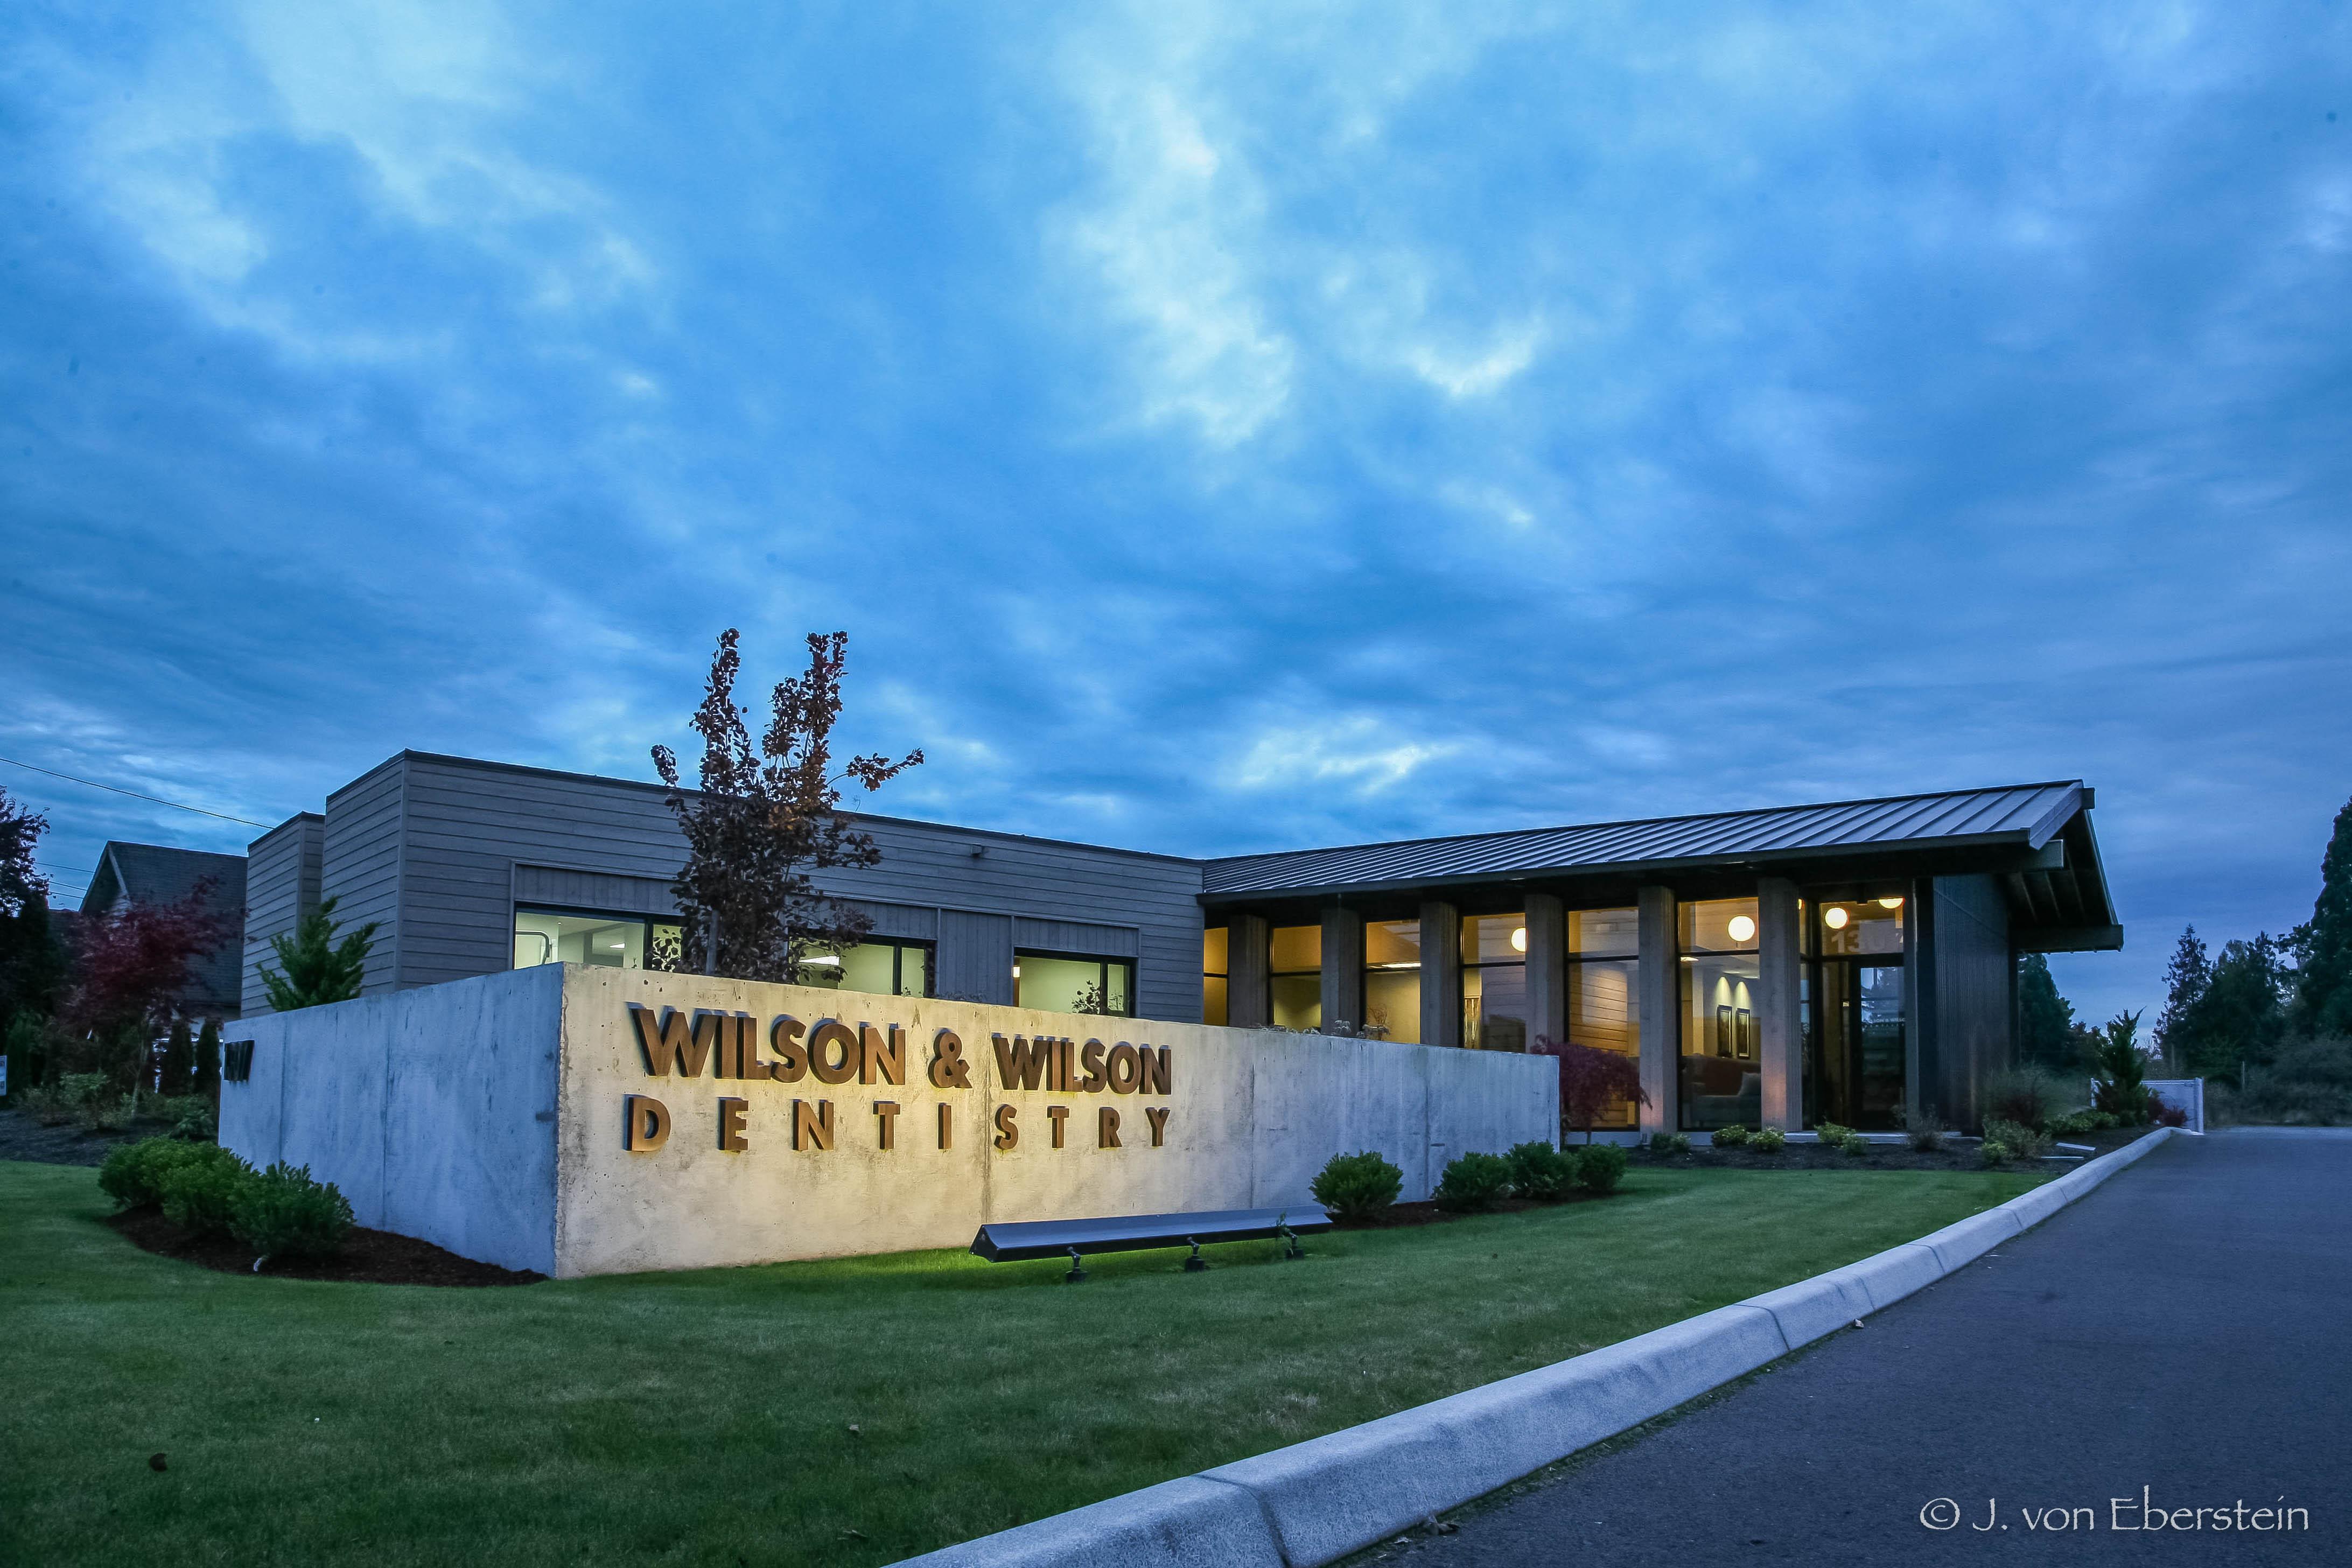 Wilson & Wilson Dentistry, Centralia, WA